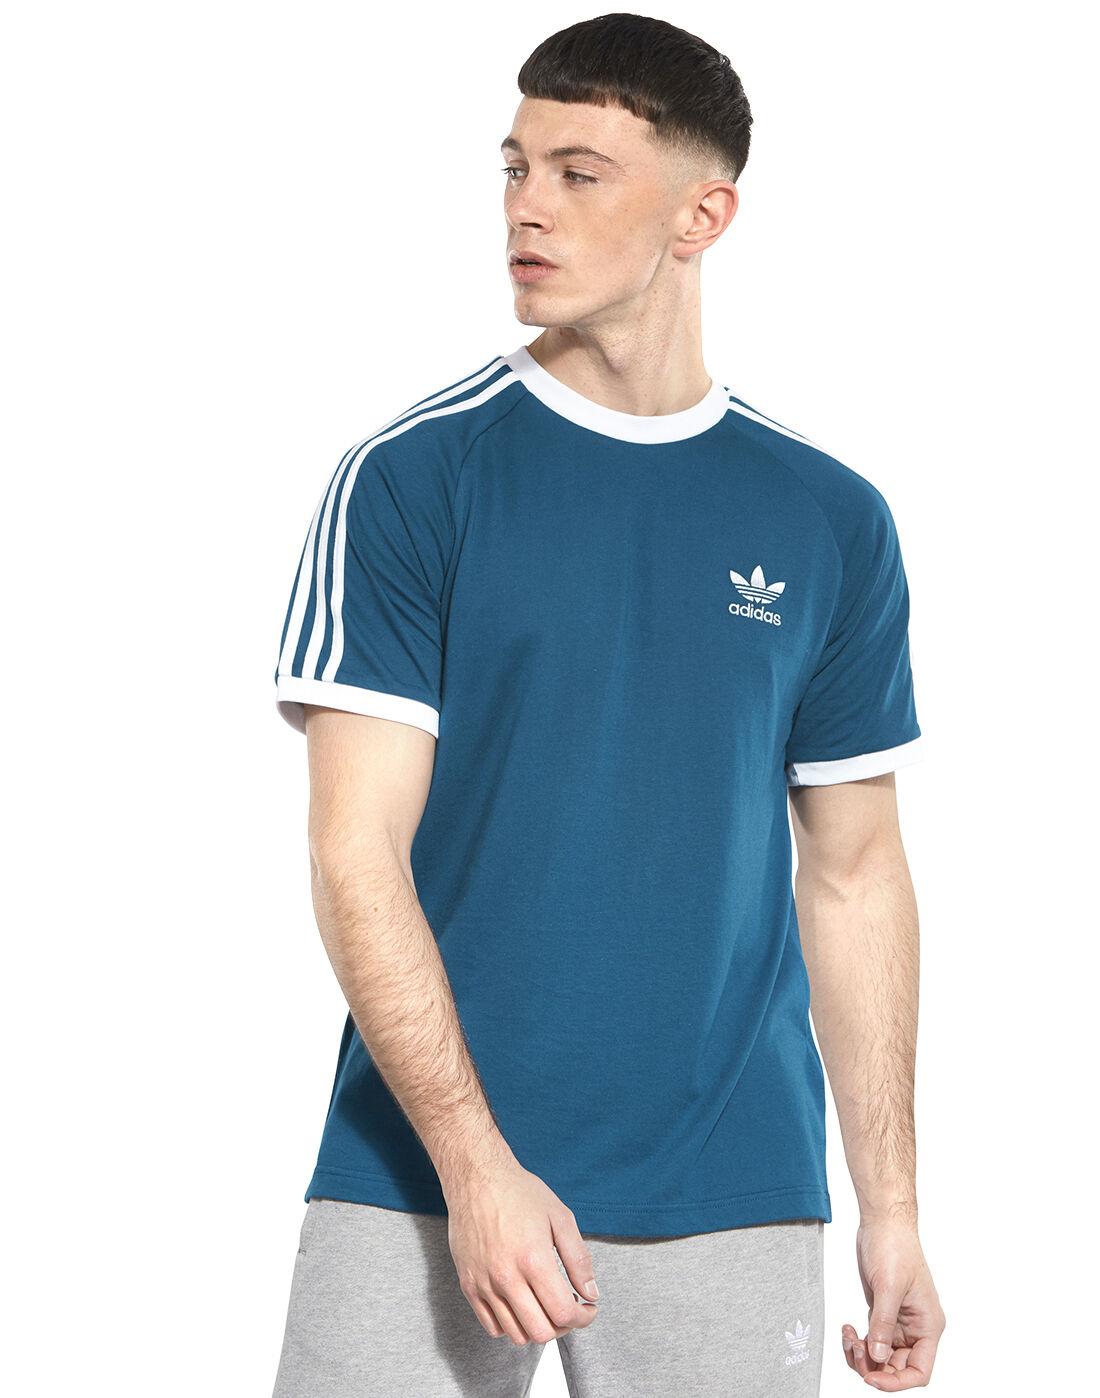 blue adidas shirt mens Shop Clothing & Shoes Online